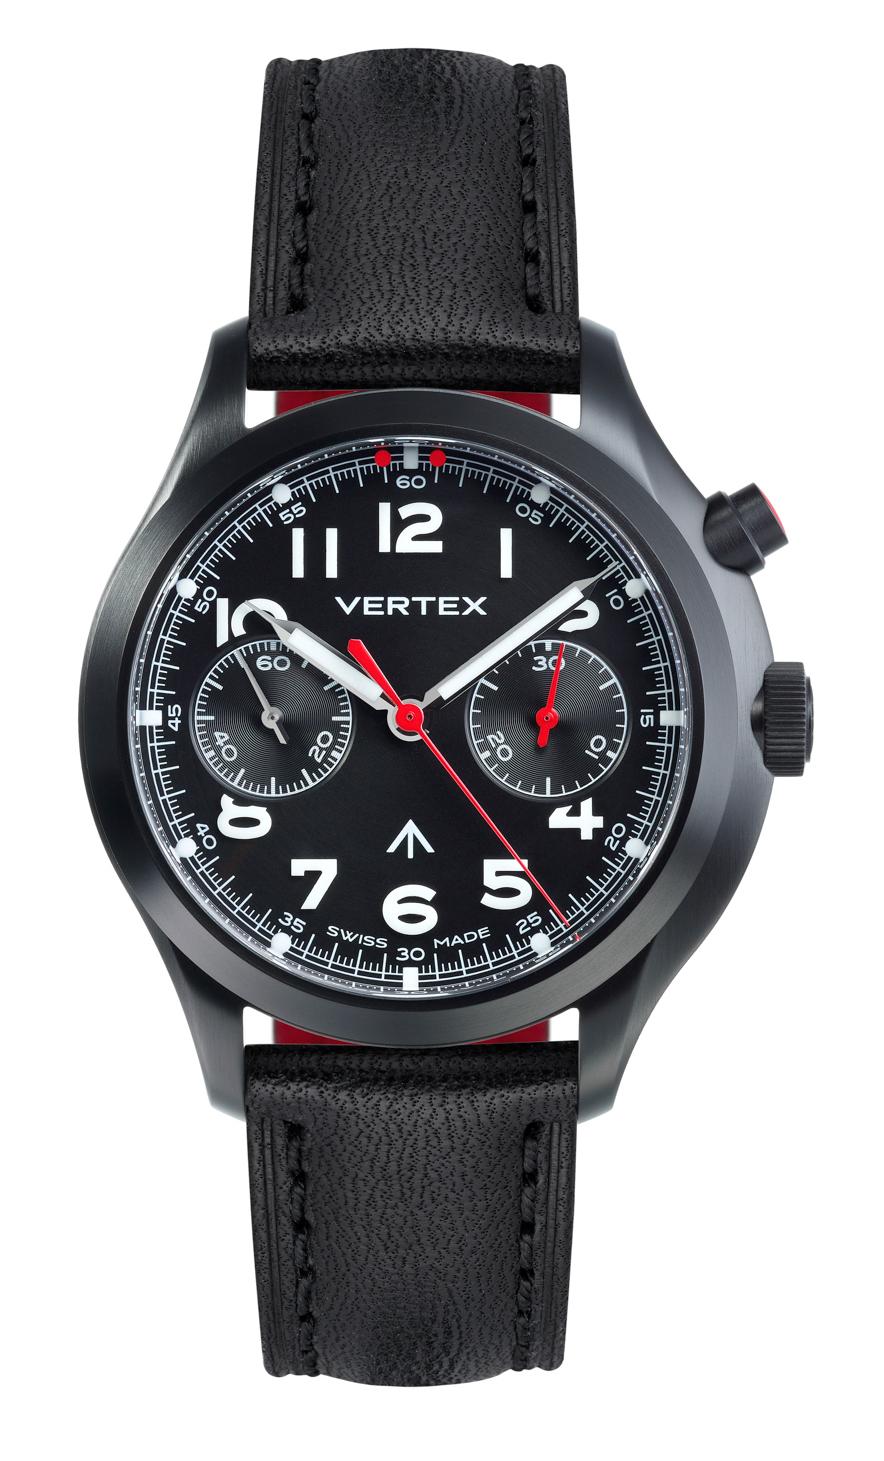 Vertex MP45B Monopusher Chronograph DLC Black